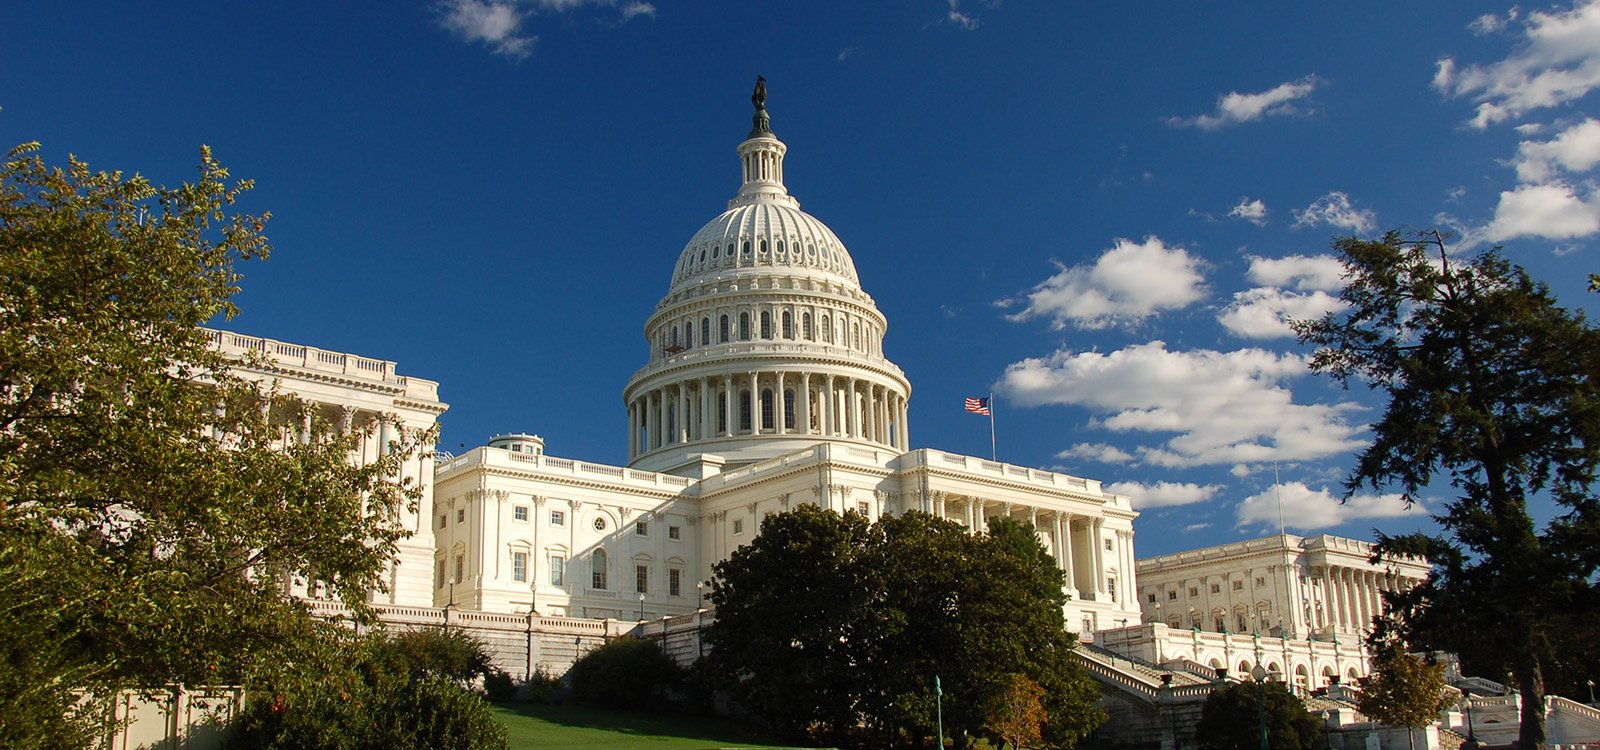 Legislators Expect Federal Legalization in 2019 | Ganjapreneur